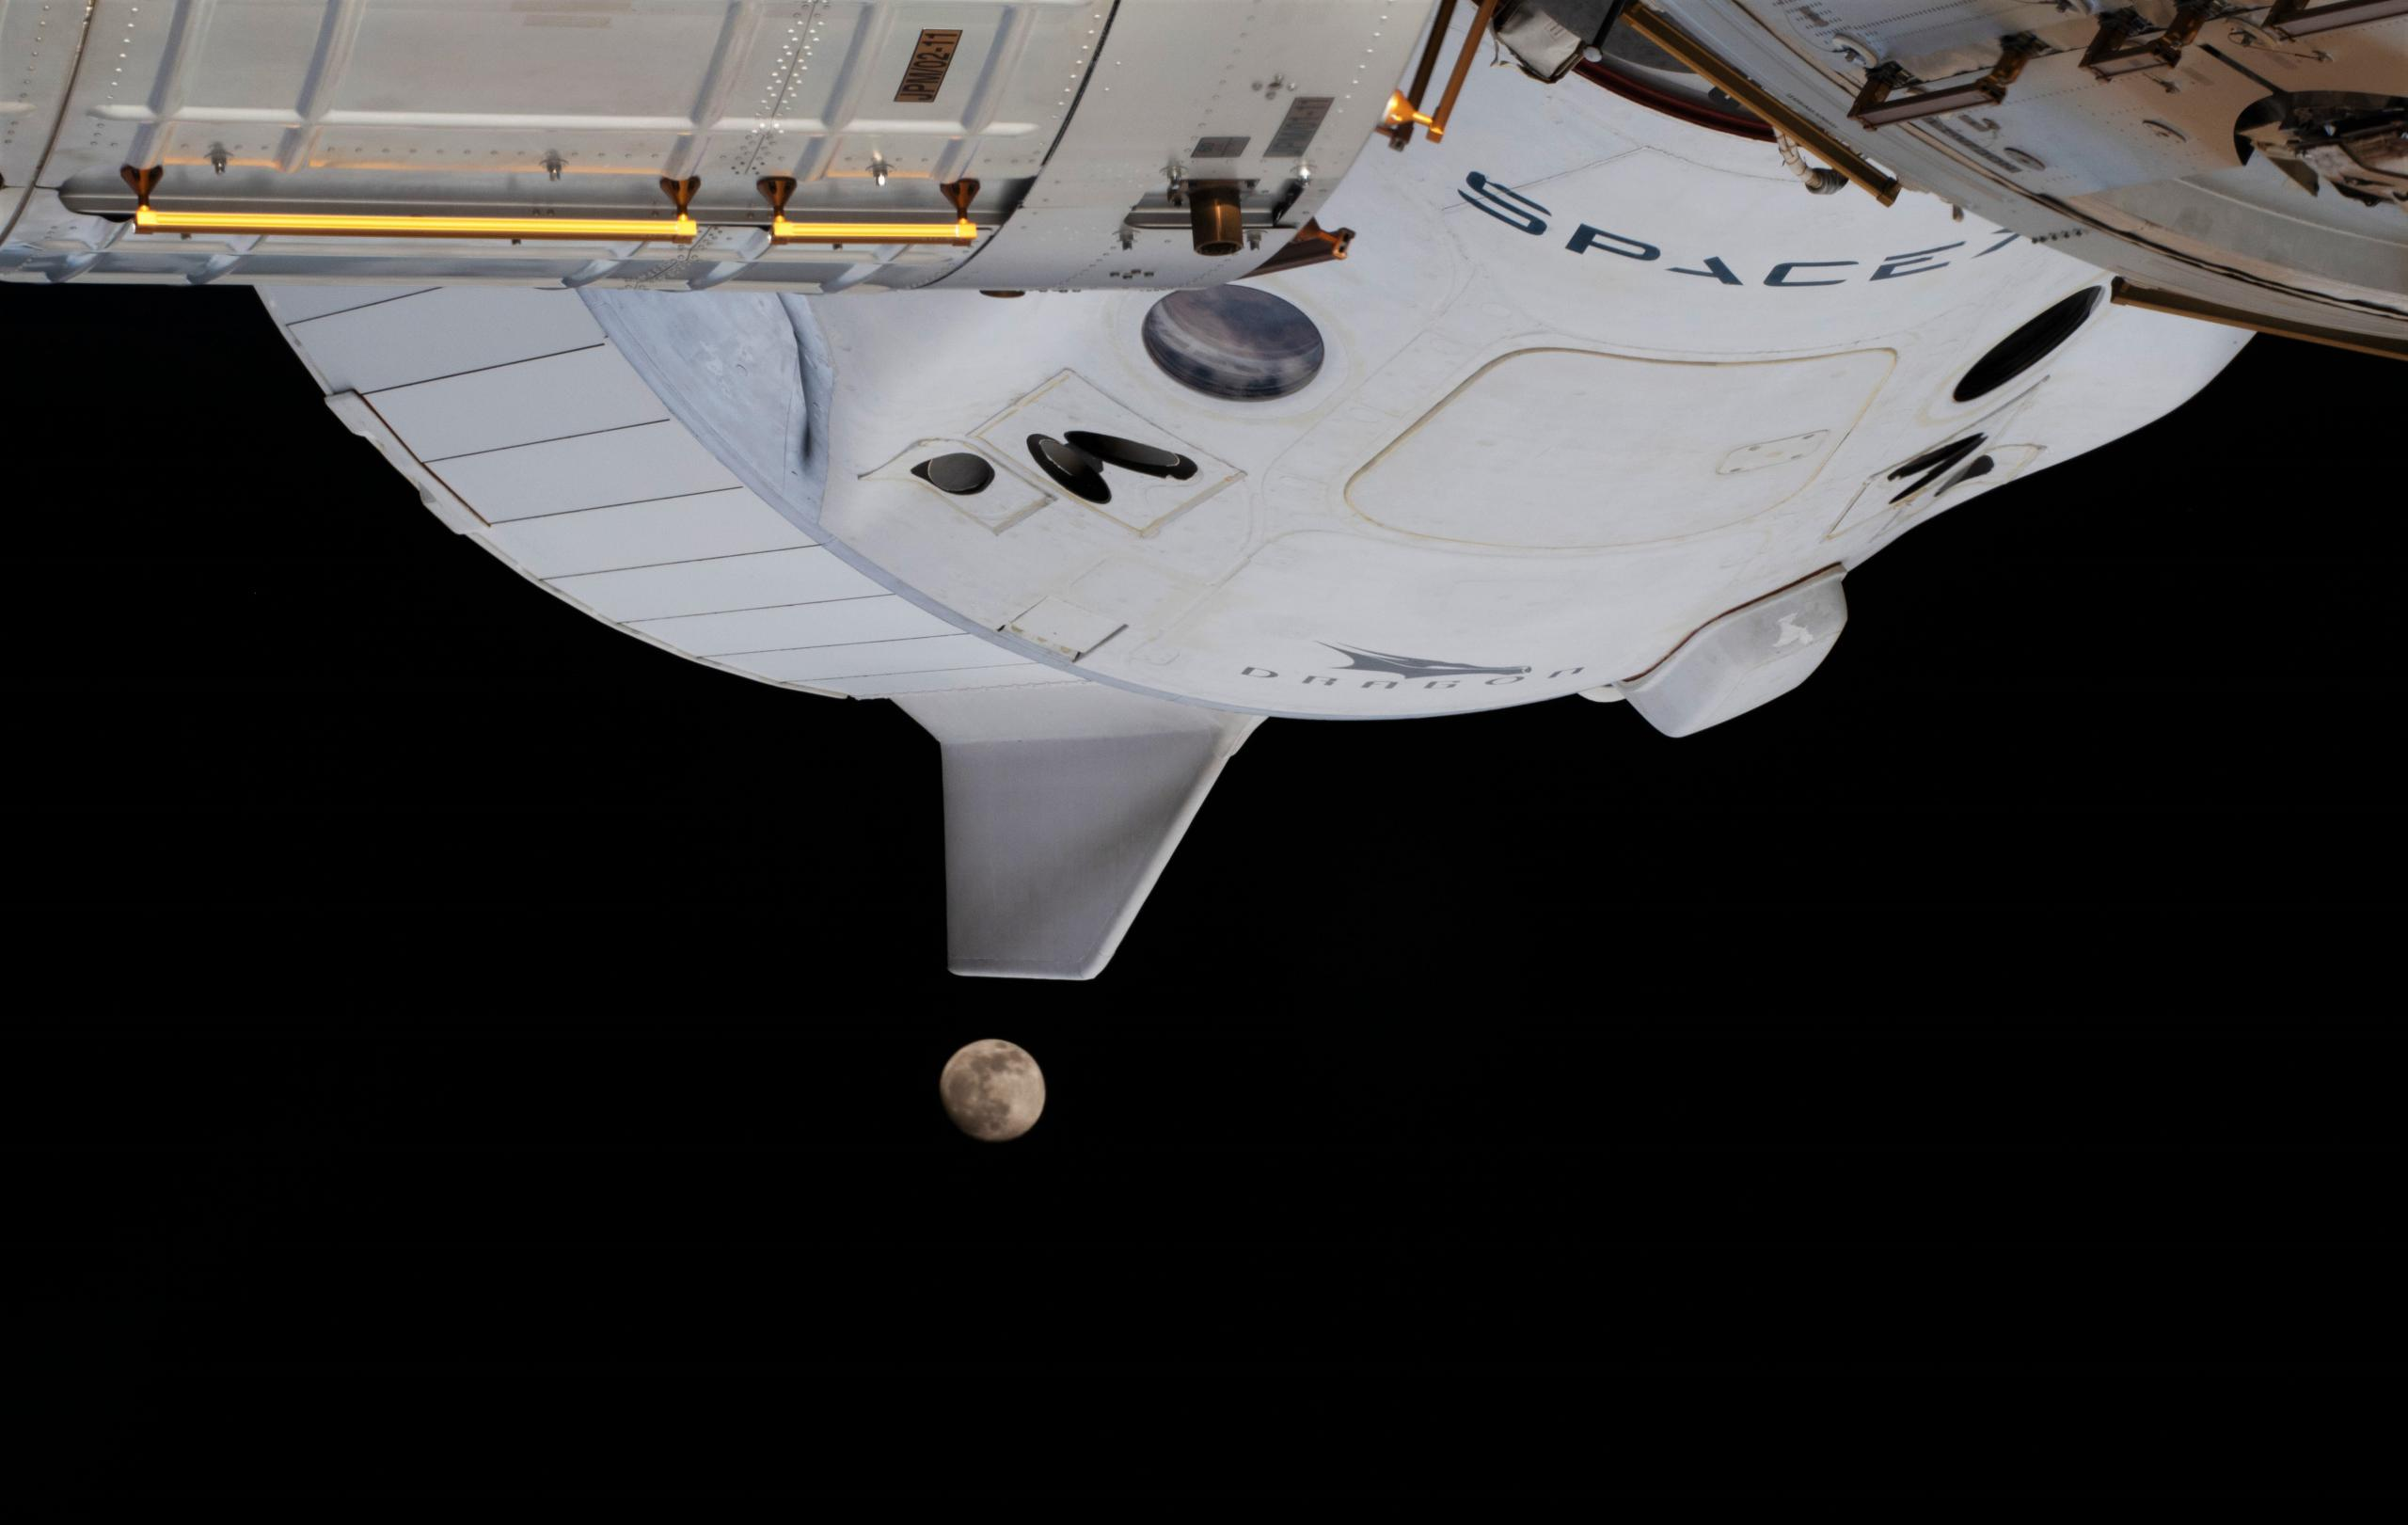 Crew Dragon C207 Crew-1 ISS 012621 (NASA) Moon eclipse 2 crop (c)